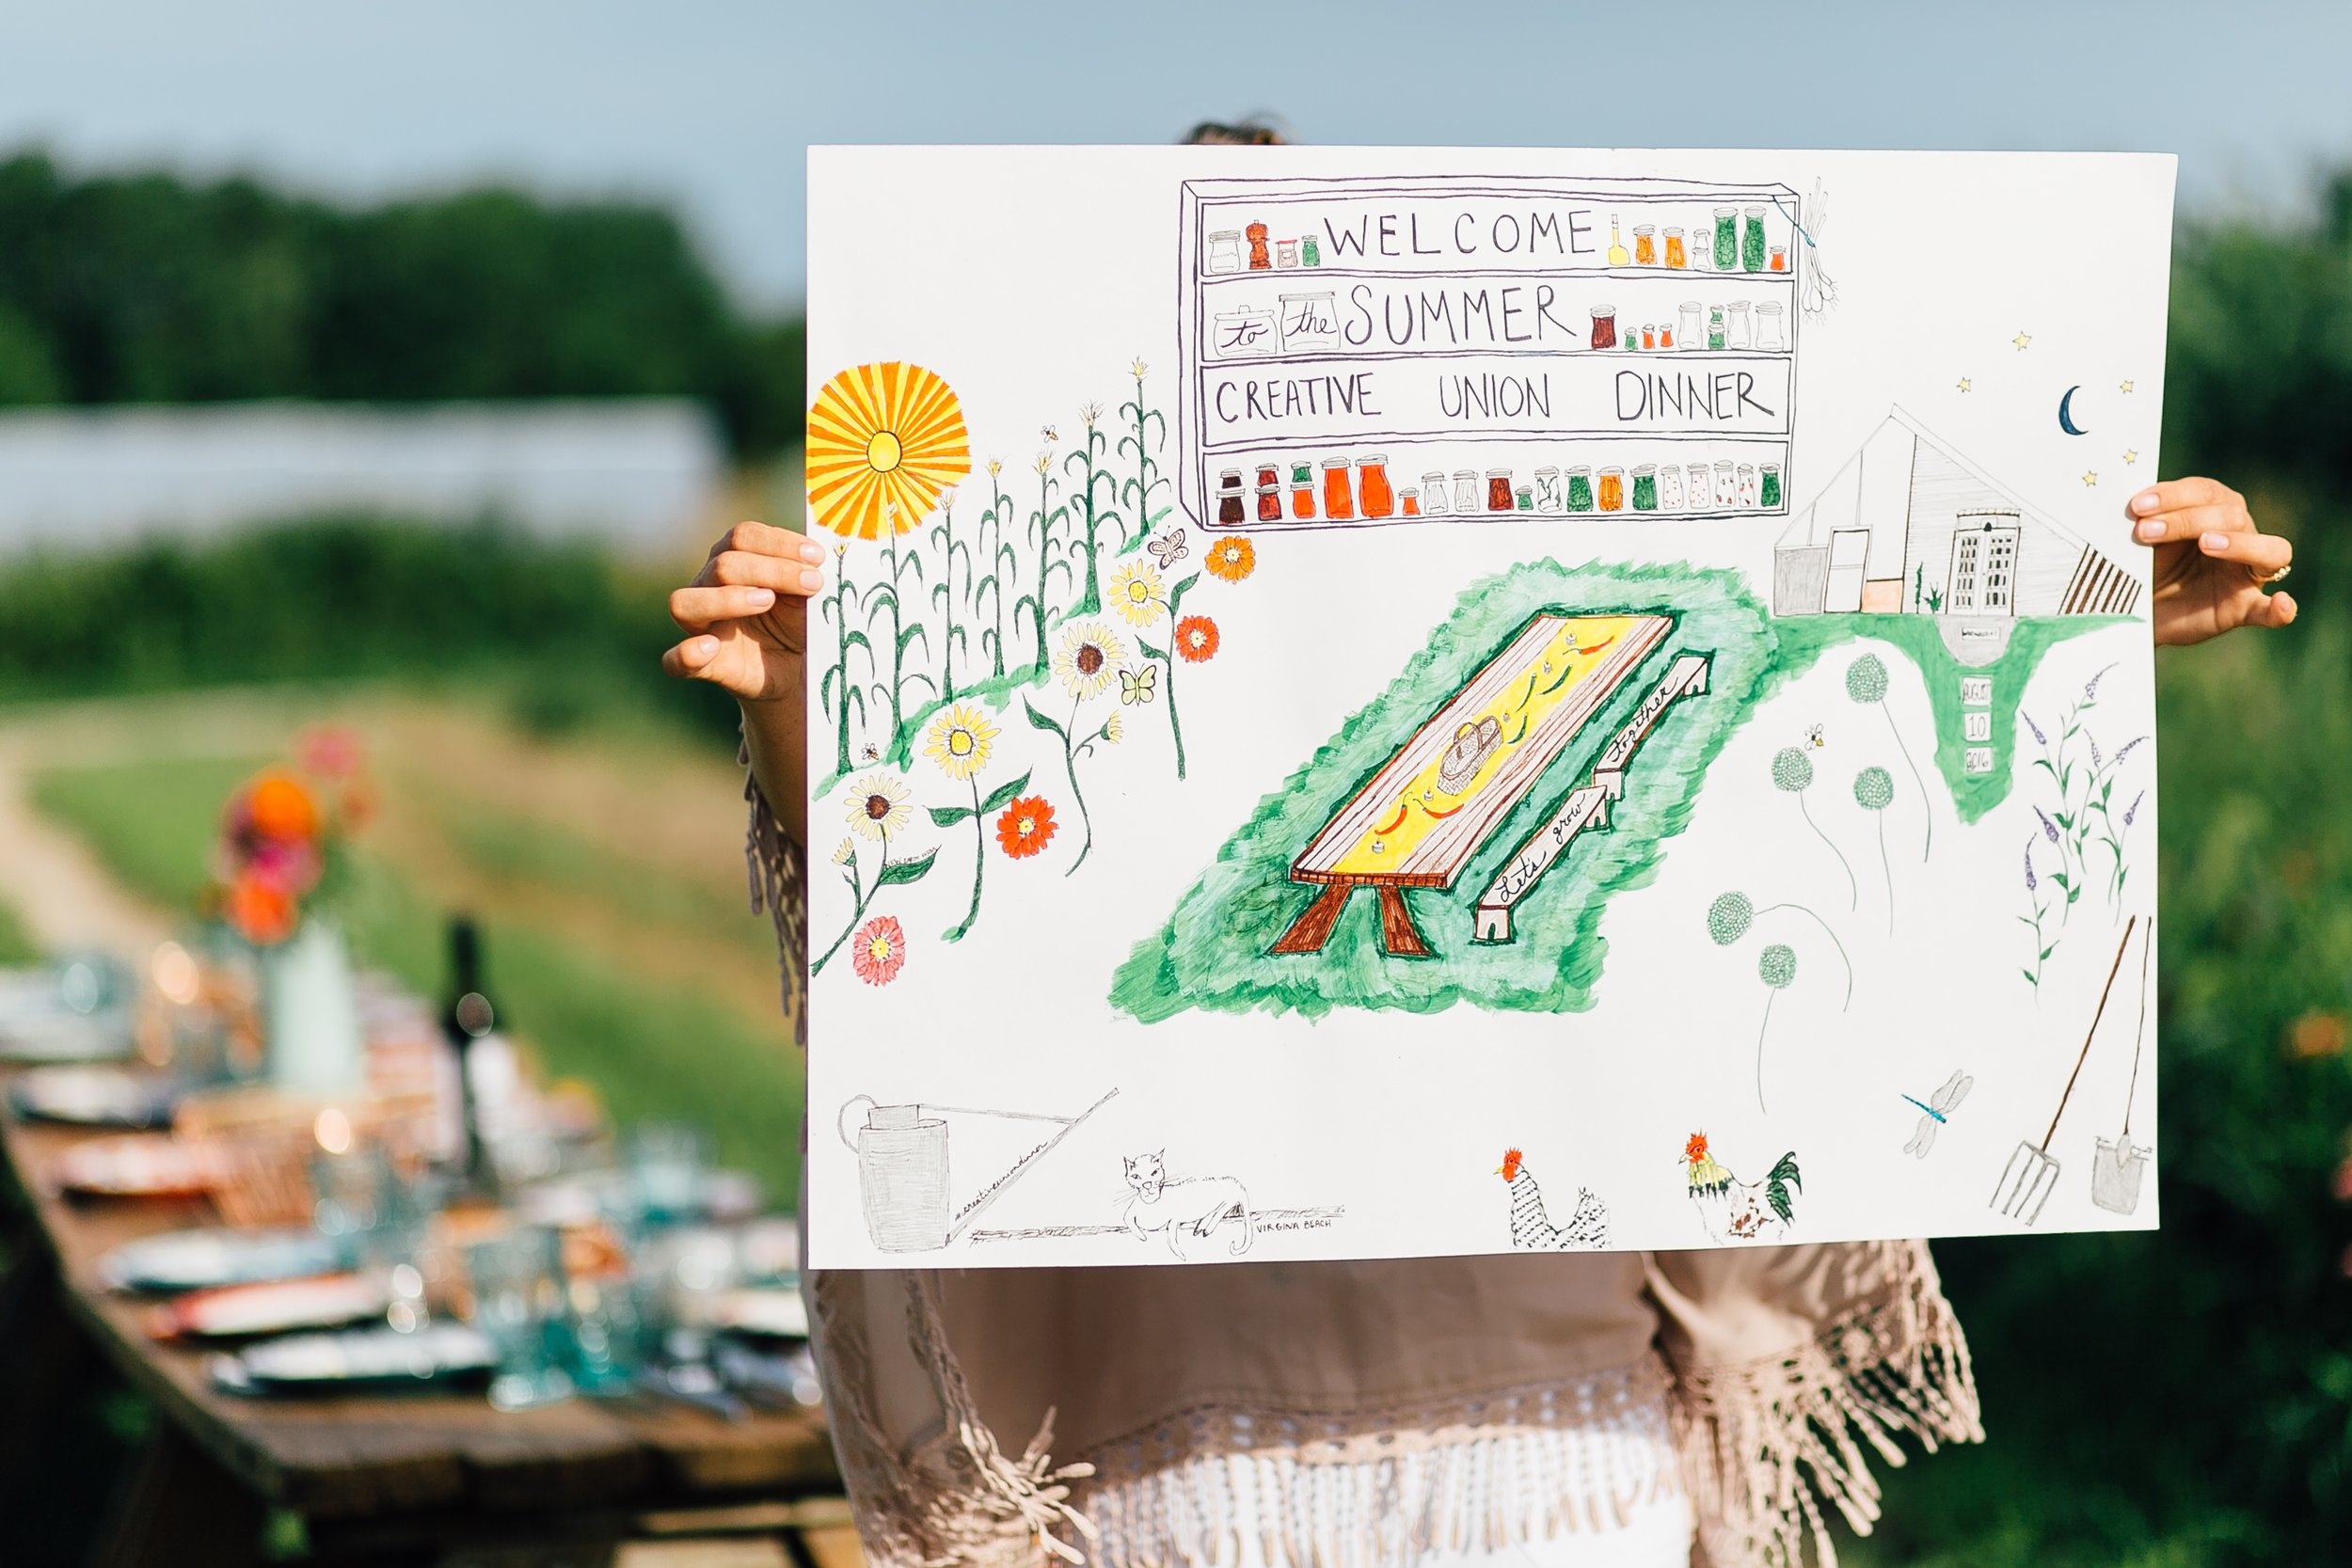 August 10, 2016Creative Union DinnerNew Earth FarmIllustration -